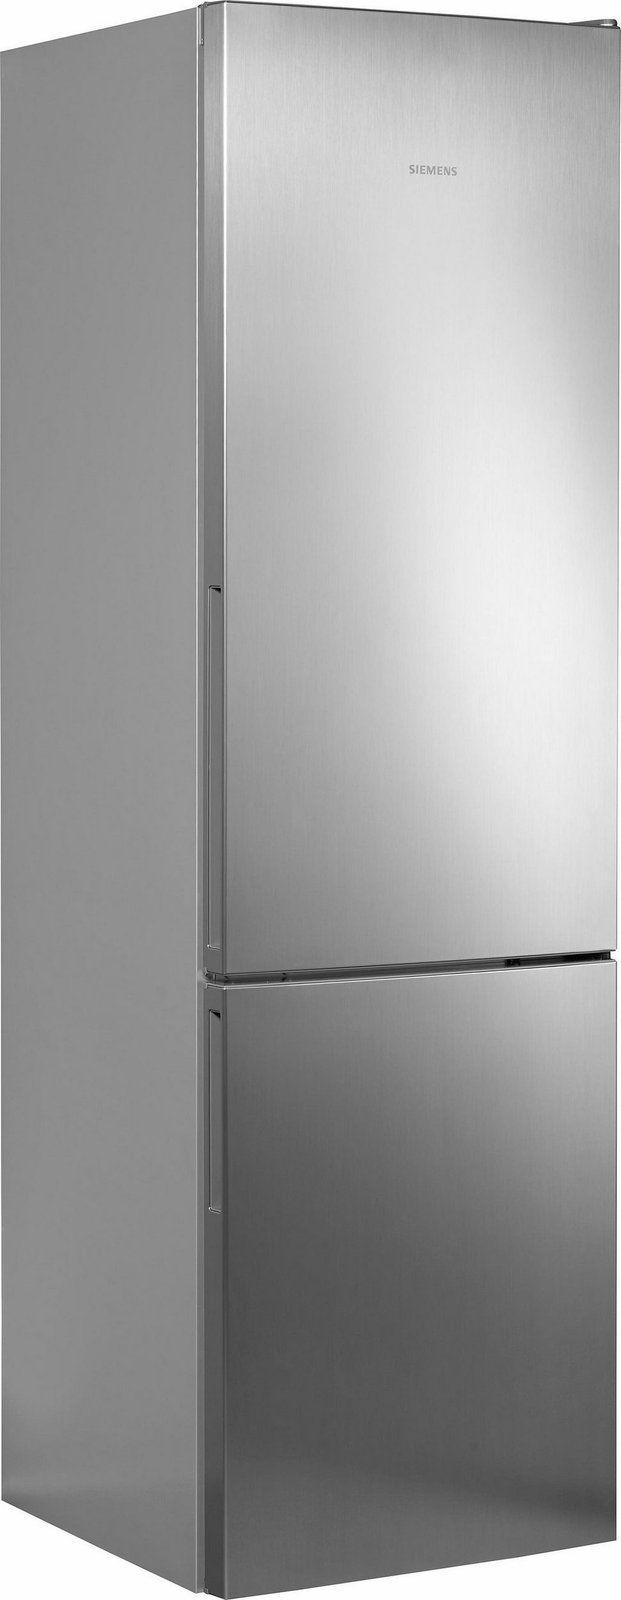 23 best Kühlschränke images on Pinterest   Refrigerators ...